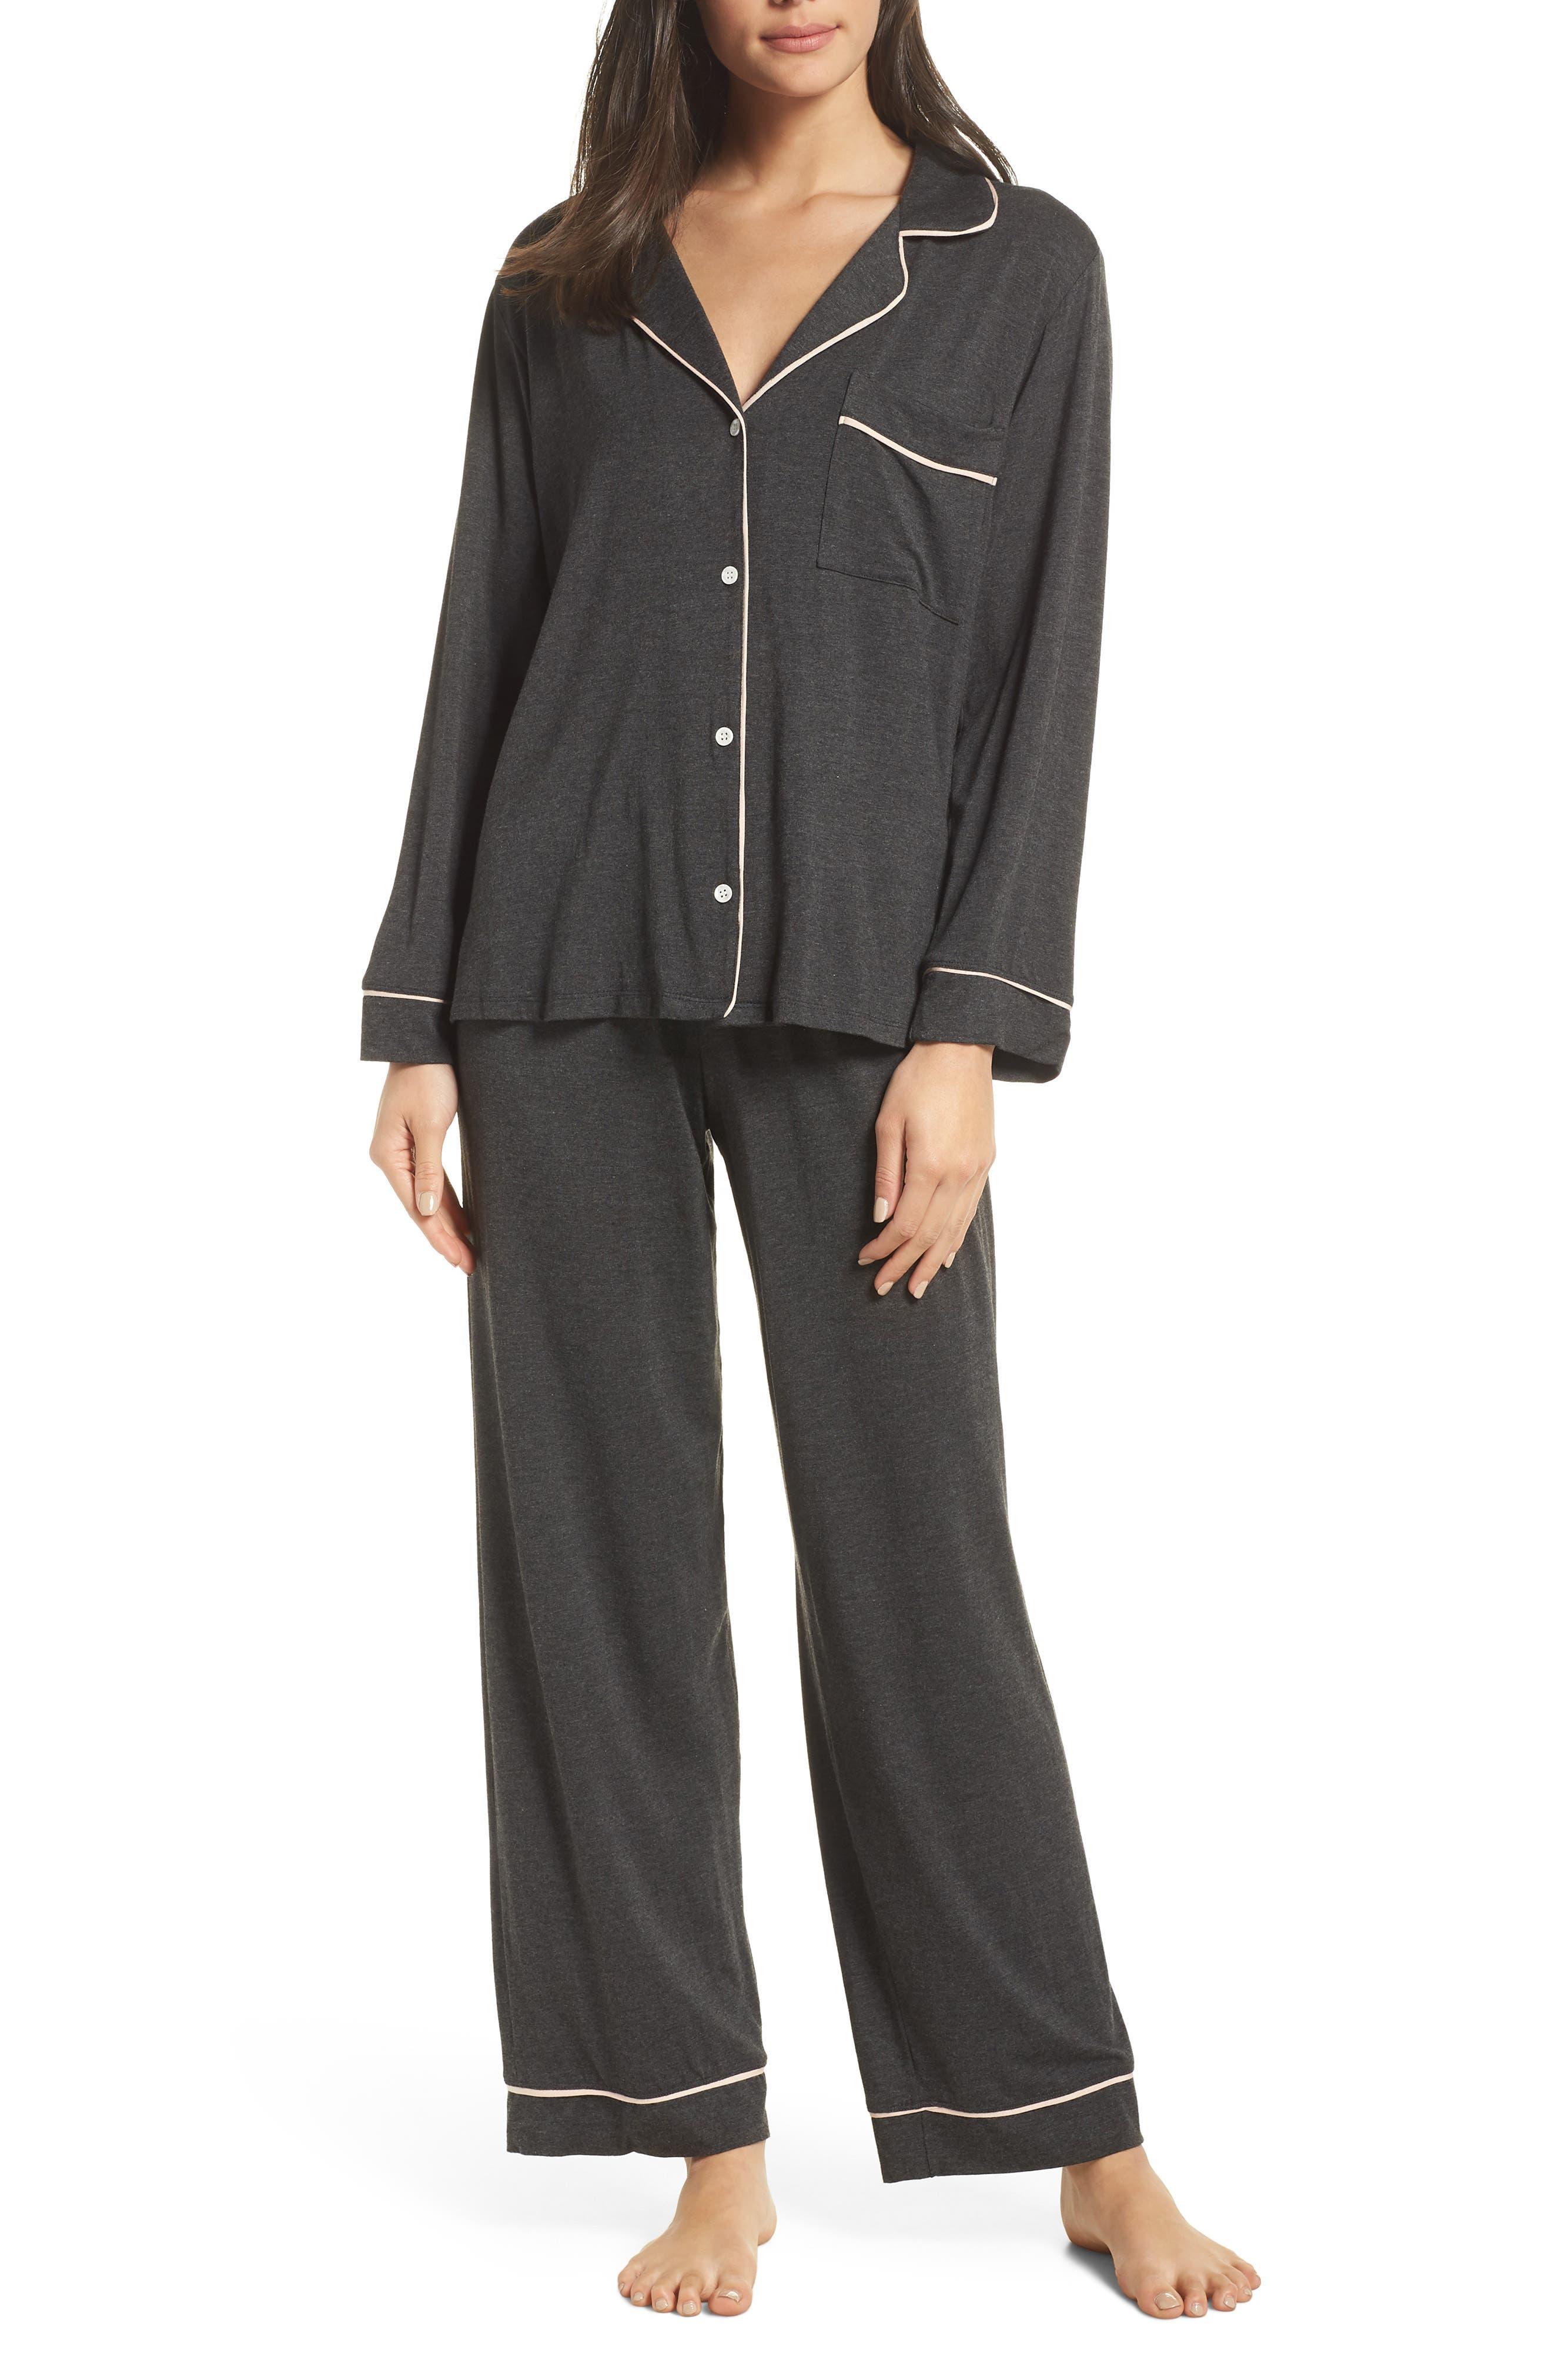 Gisele Pajamas,                             Main thumbnail 1, color,                             CHARCOAL/ BELLINI